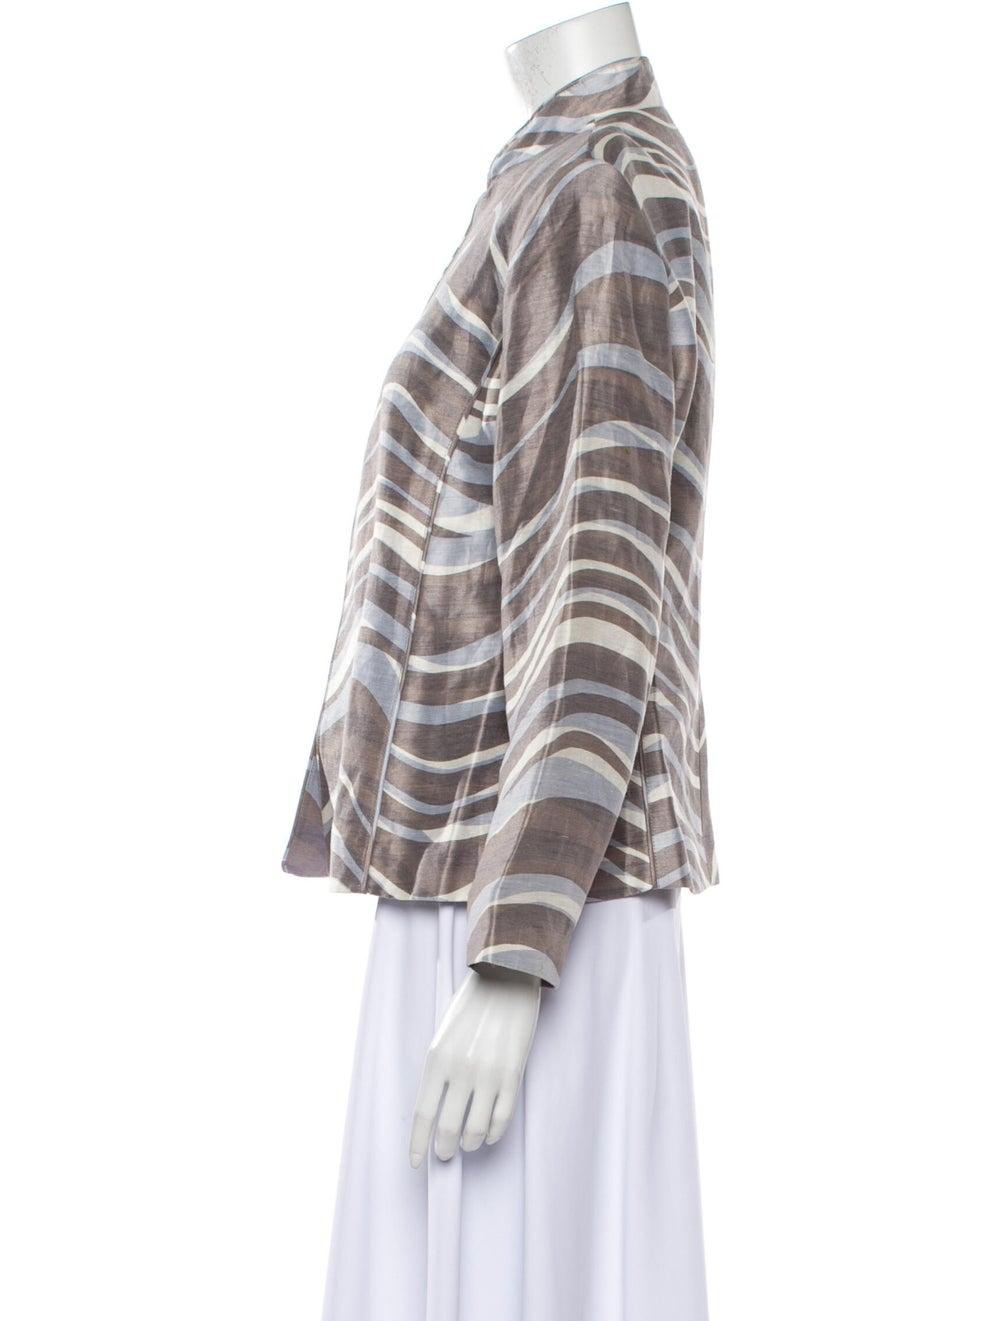 Lafayette 148 Linen Striped Jacket Grey - image 2